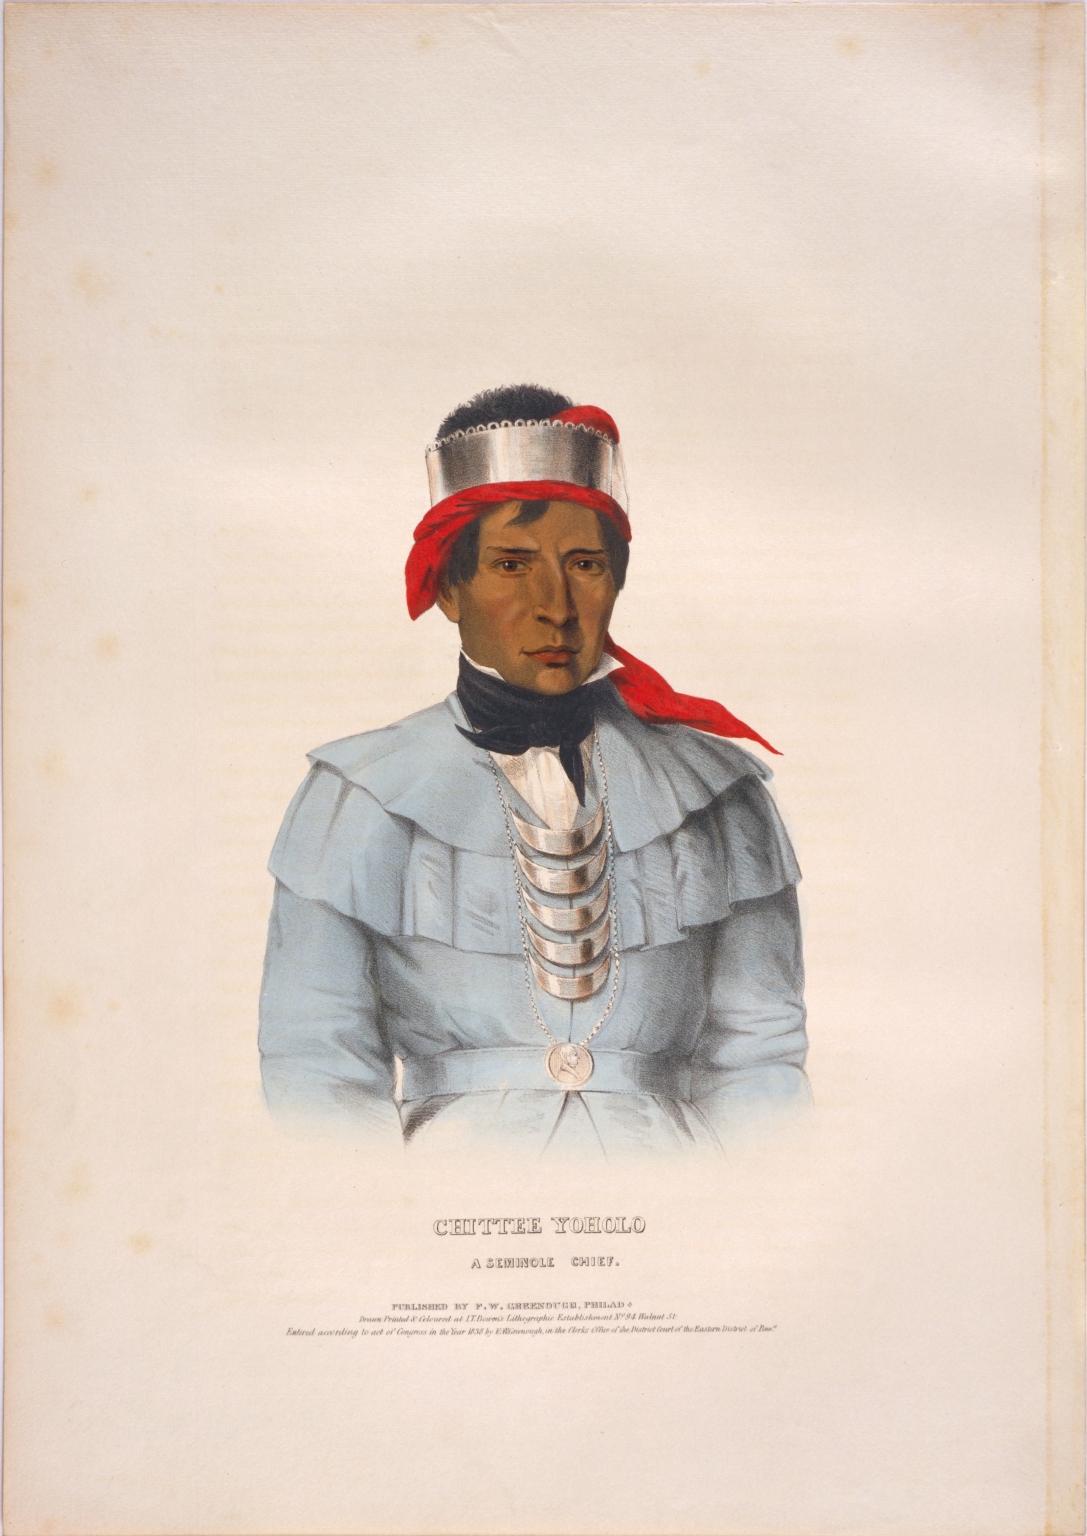 Chittee Yoholo, a Seminole chief